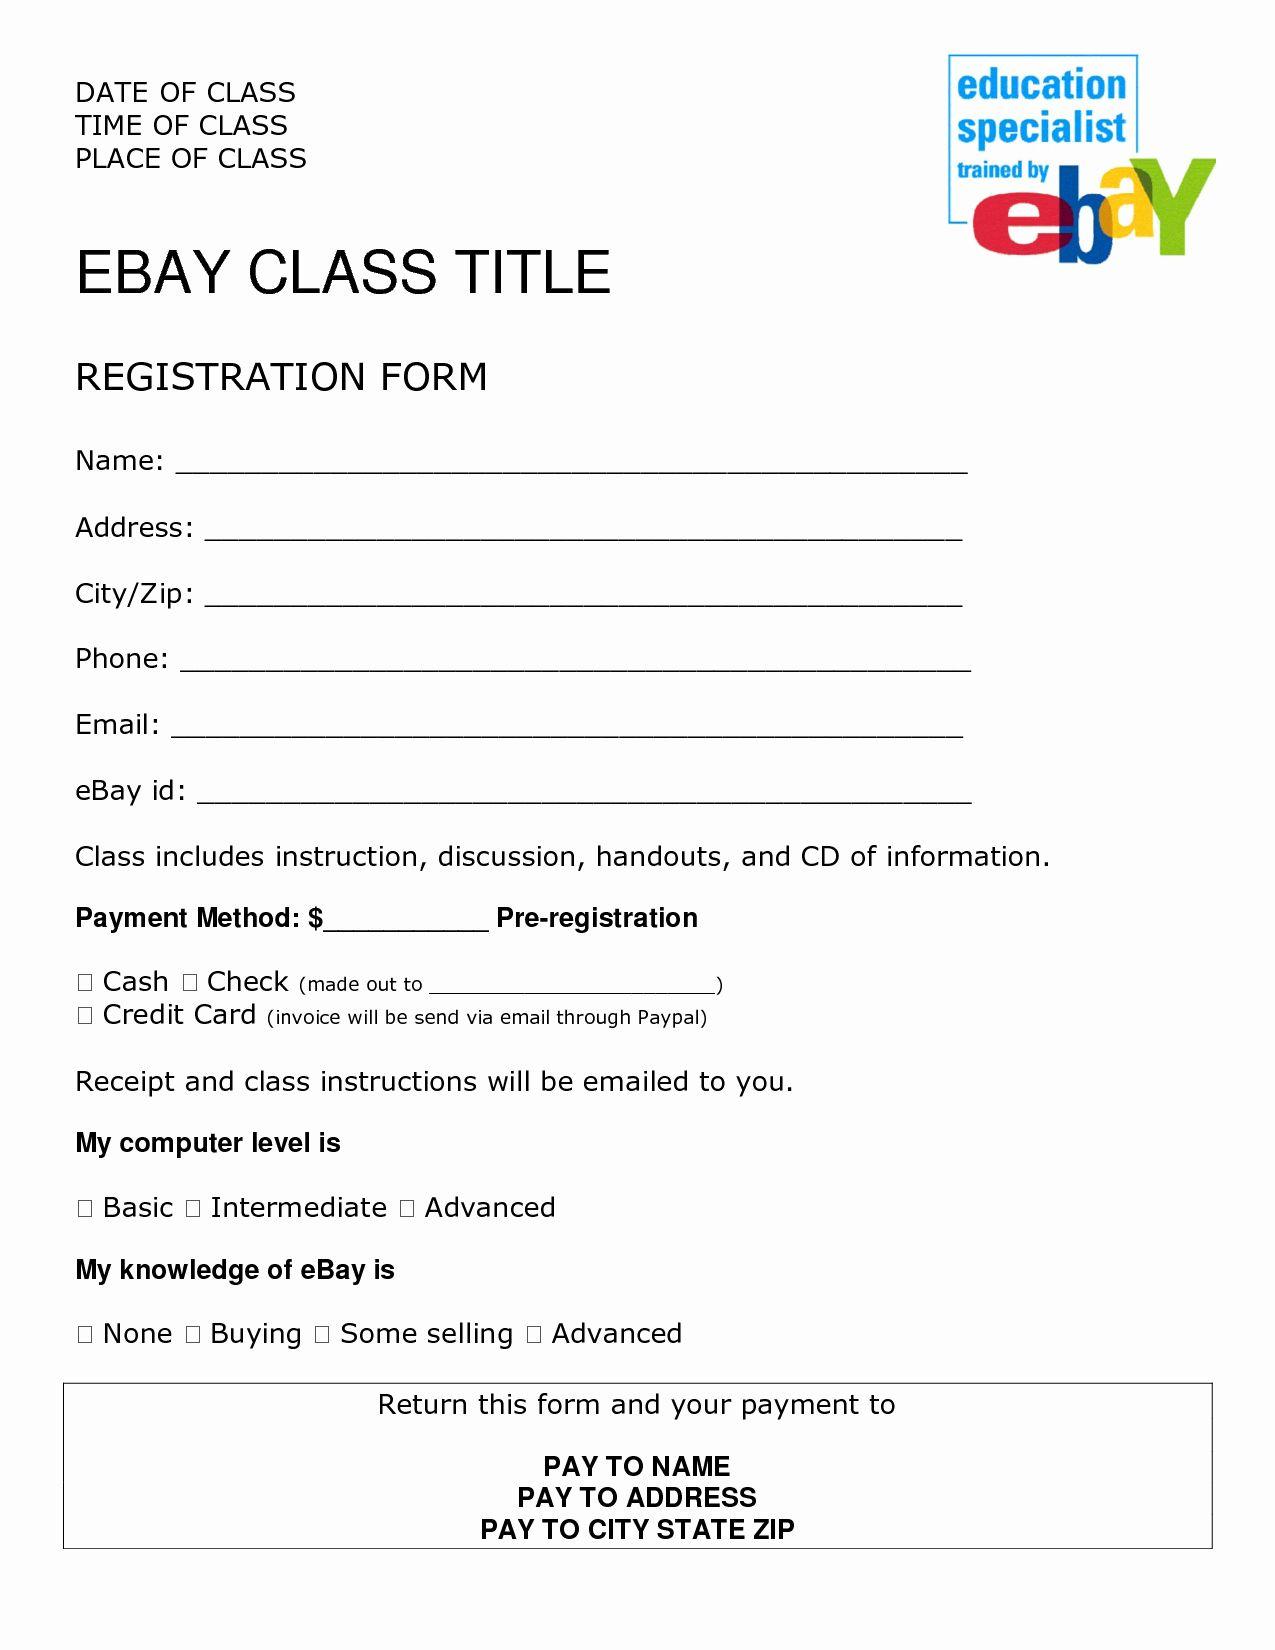 Registration Form Template Word Fresh Sign Up Form Template Word Portablegasgrillweber Invoice Template Word Registration Form Invoice Template